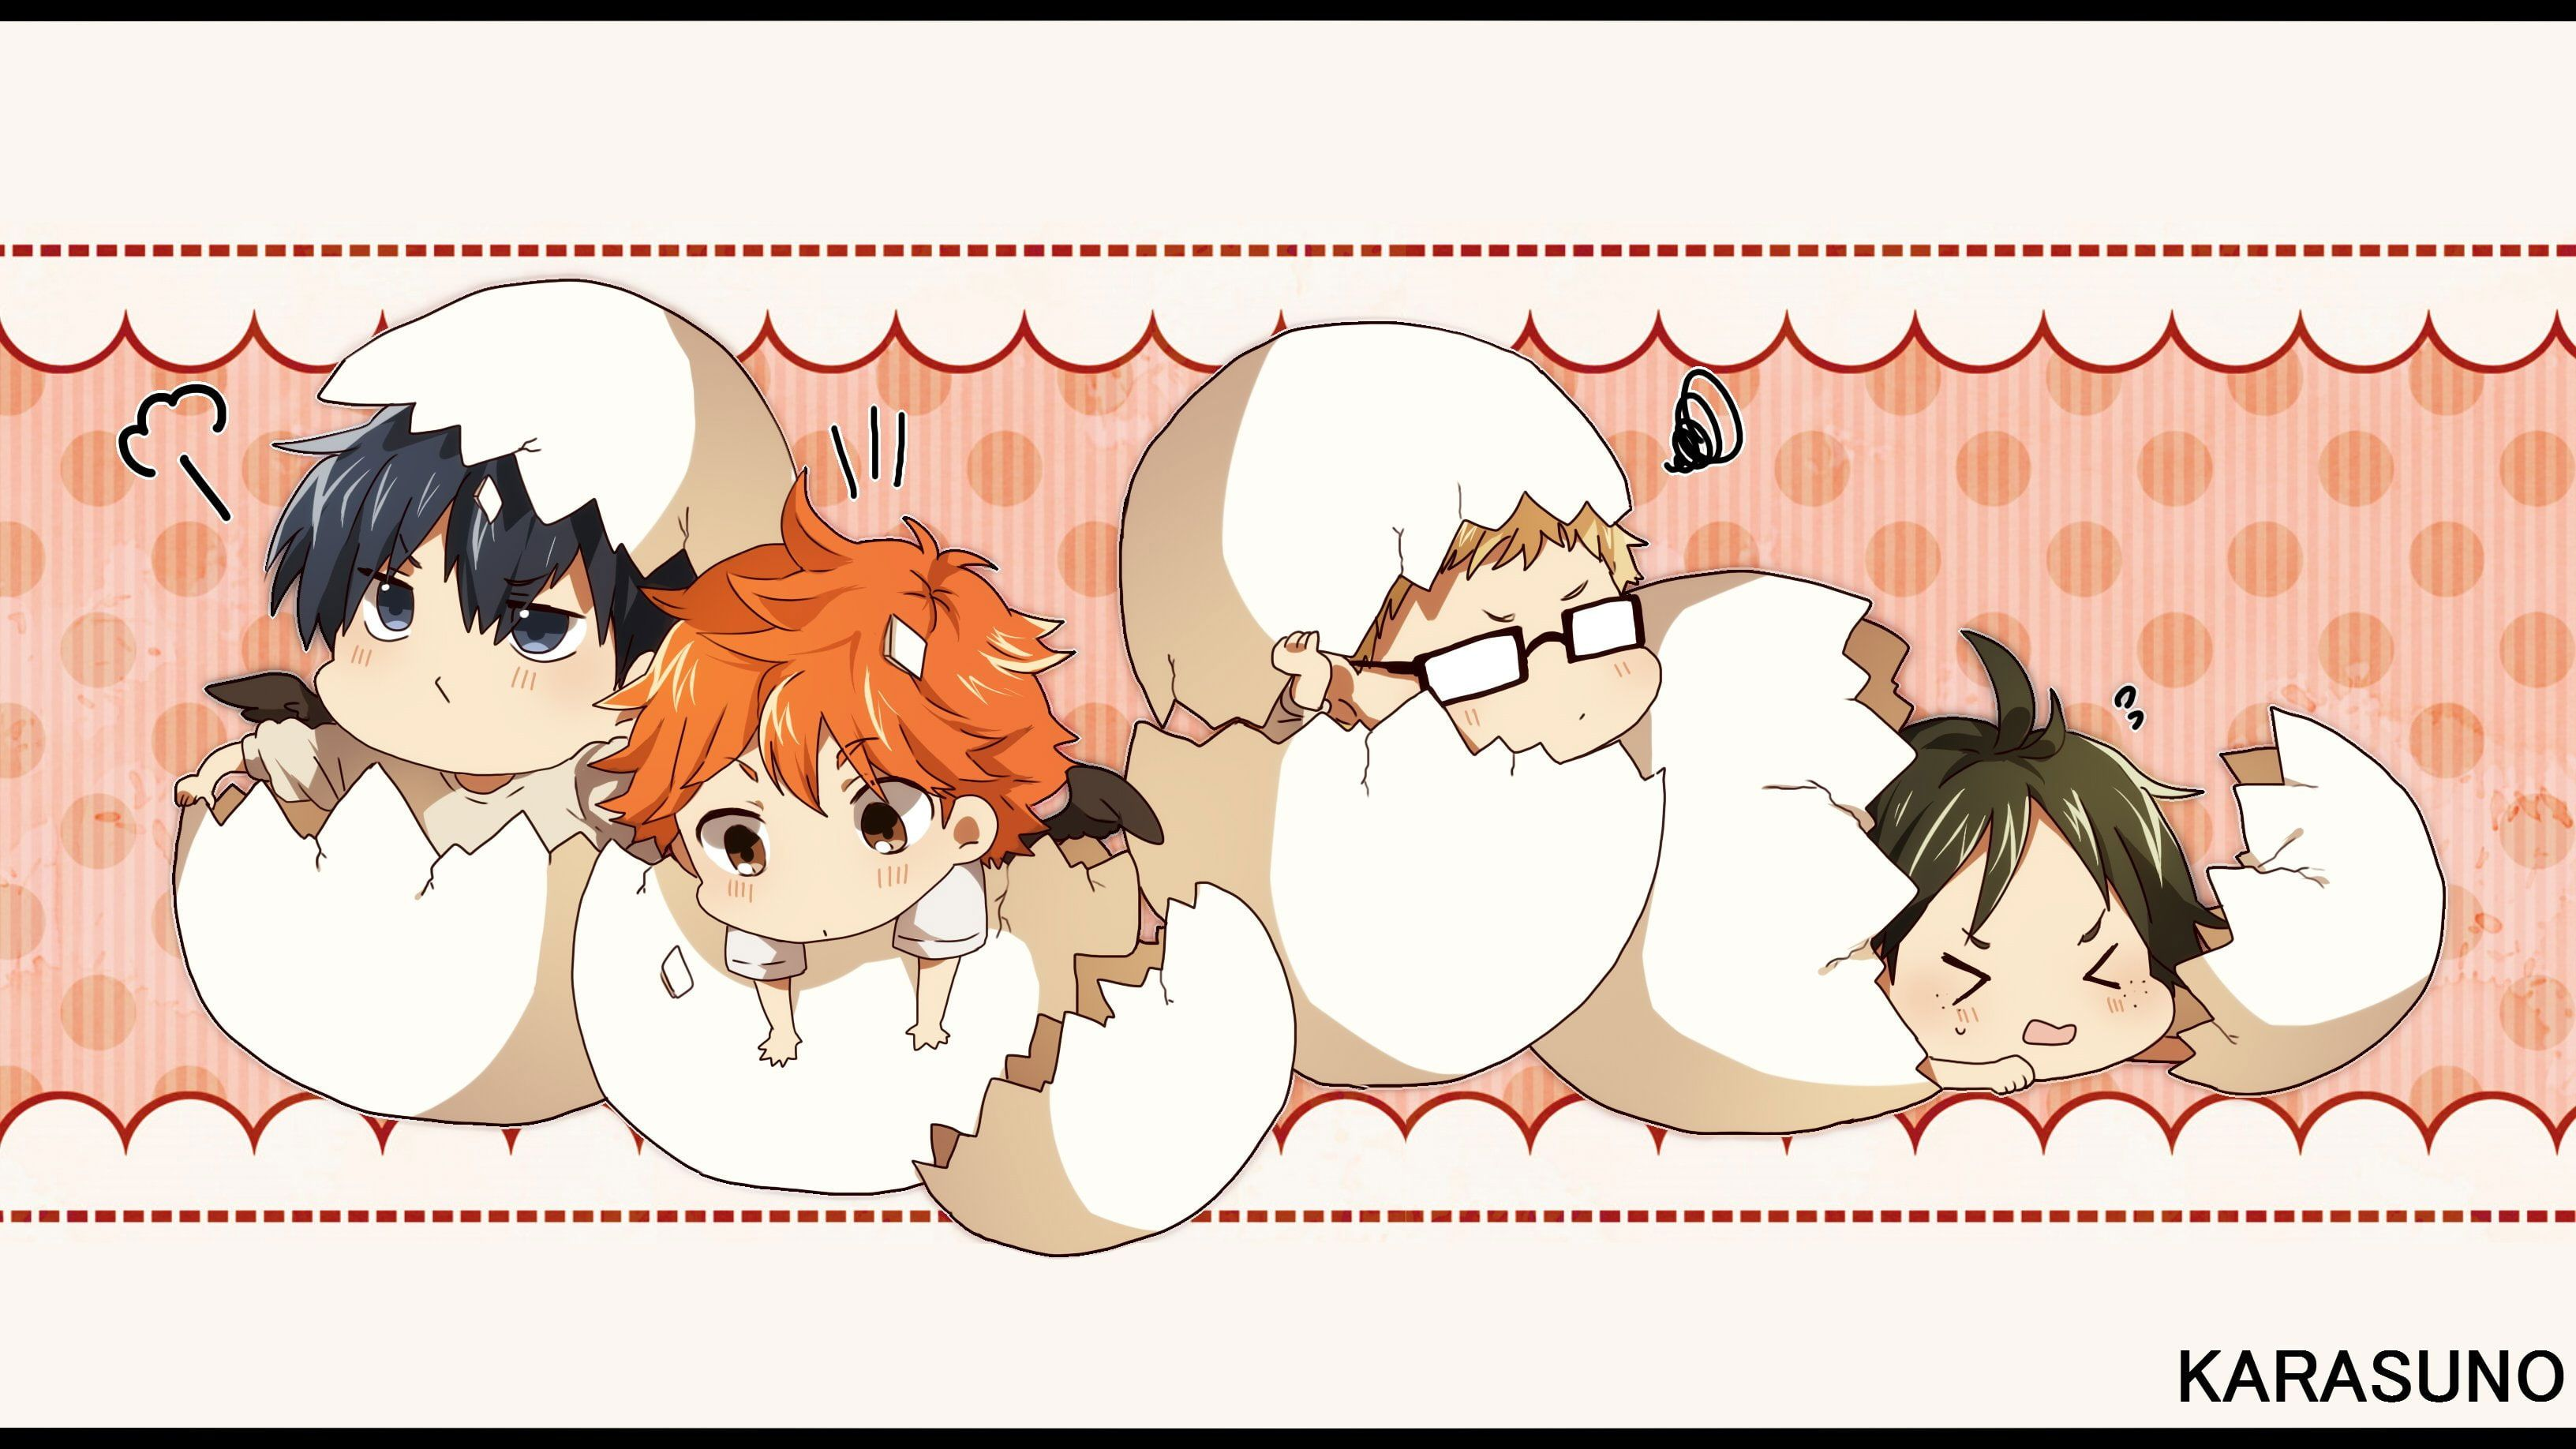 Chibi haikyuu wallpaper • Wallpaper For You HD Wallpaper For Desktop & Mobile